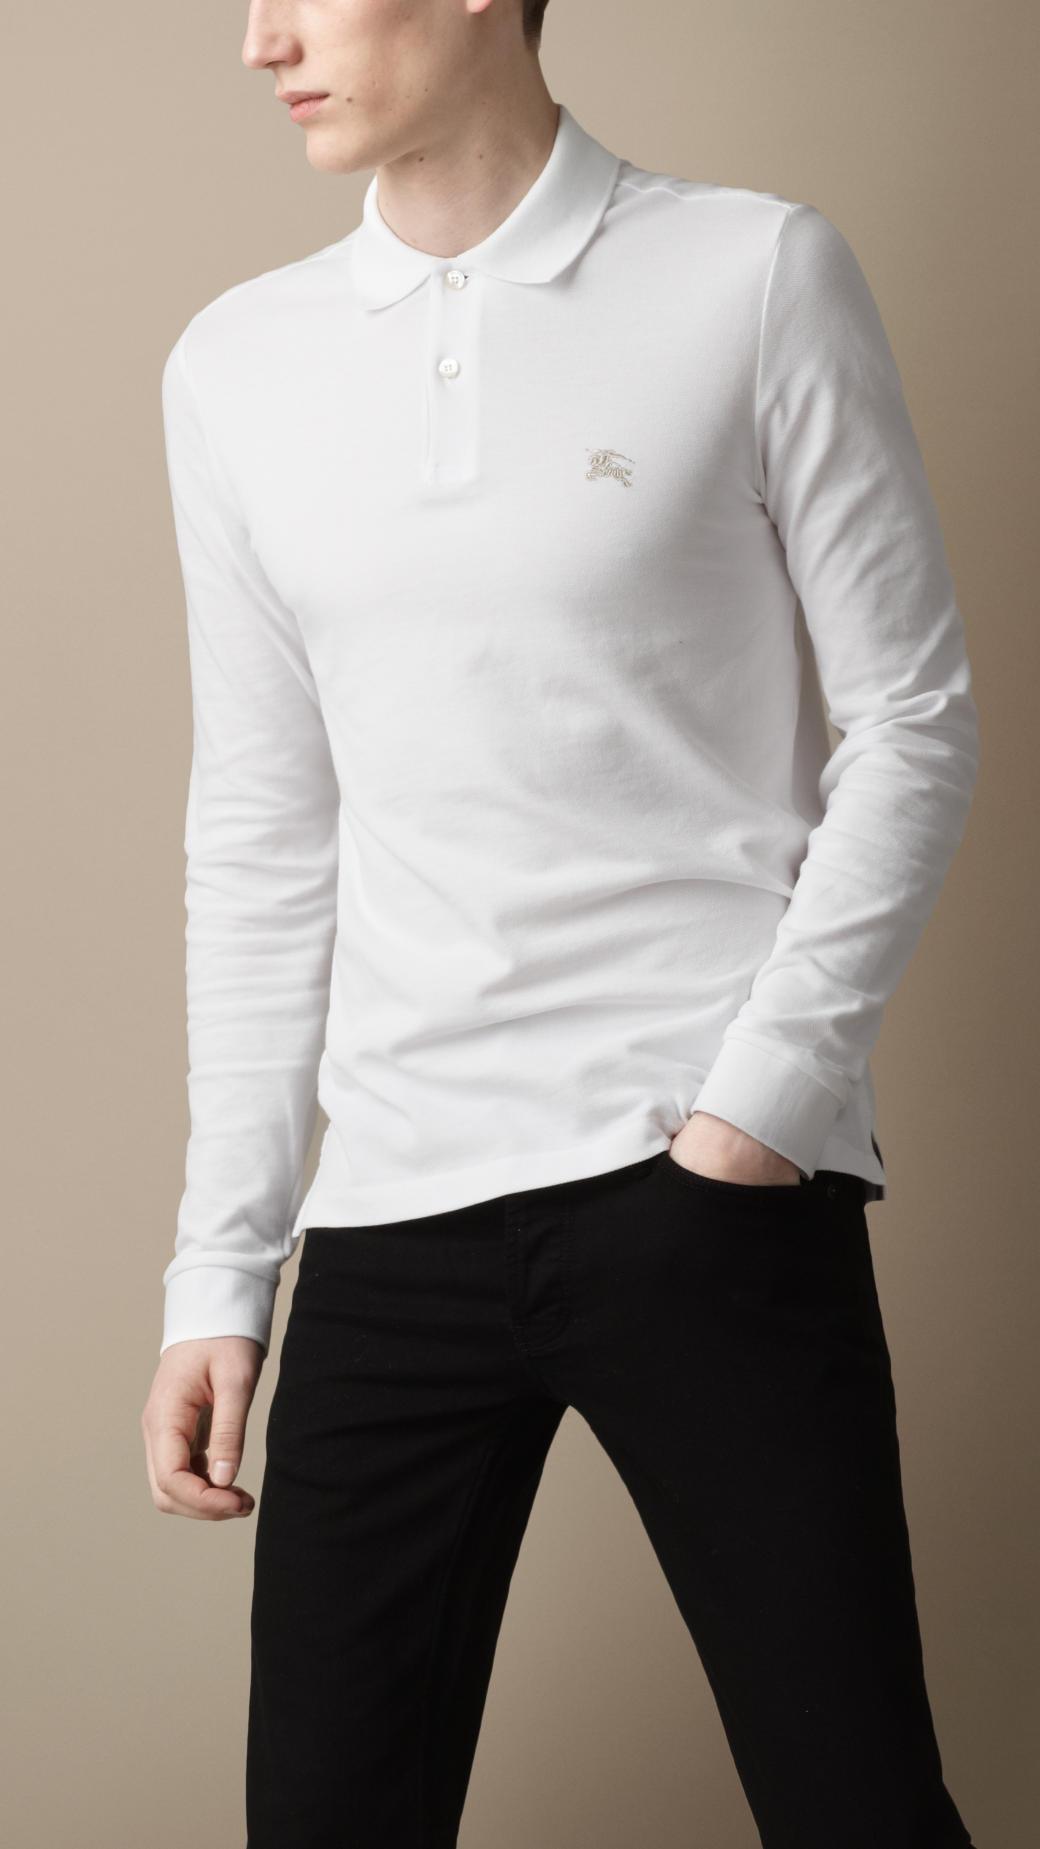 d95f4762 Mens Long Sleeve Polo Shirt White | Azərbaycan Dillər Universiteti